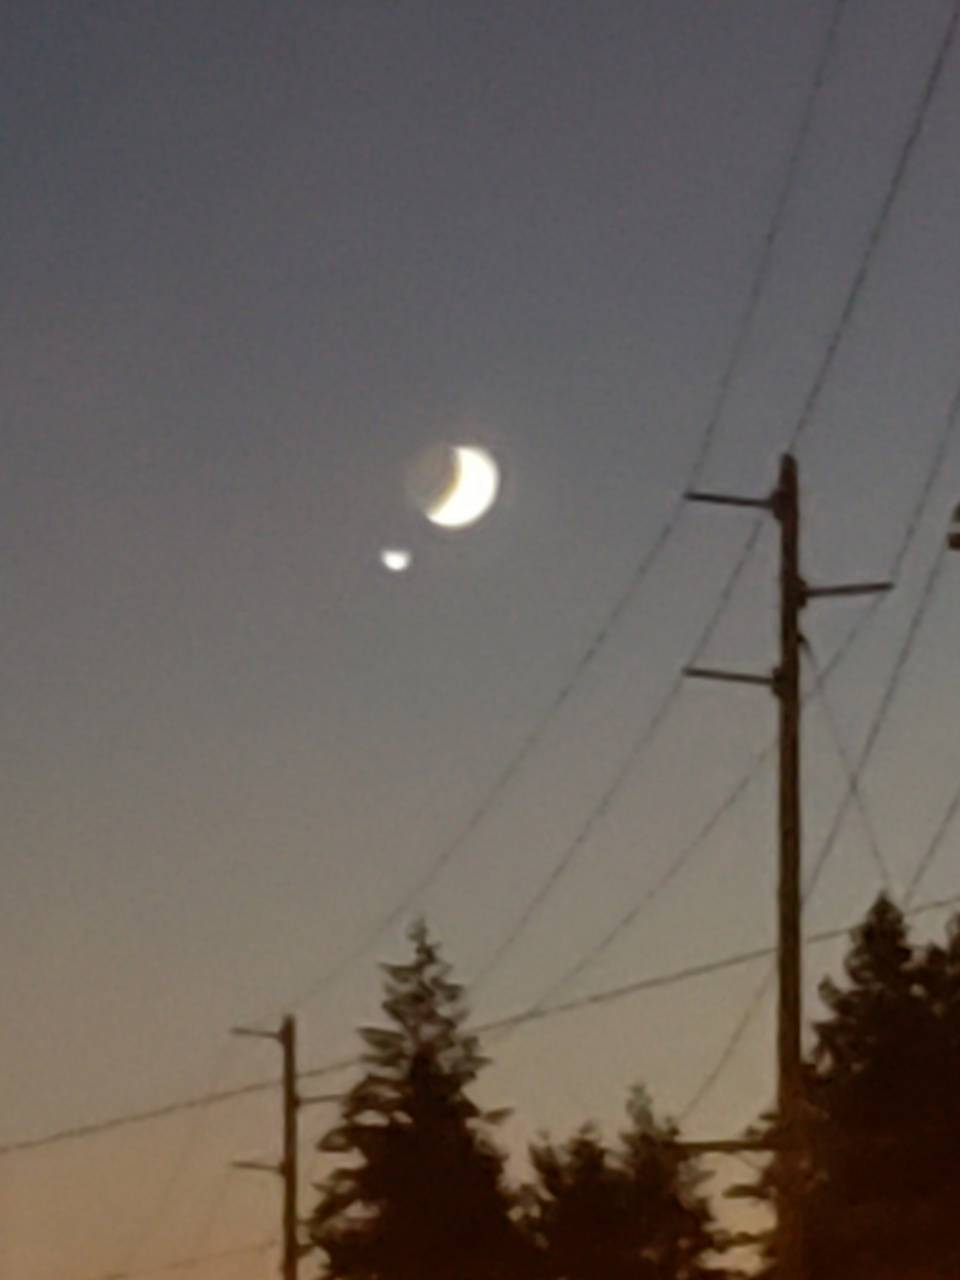 Jumped Moon On Man